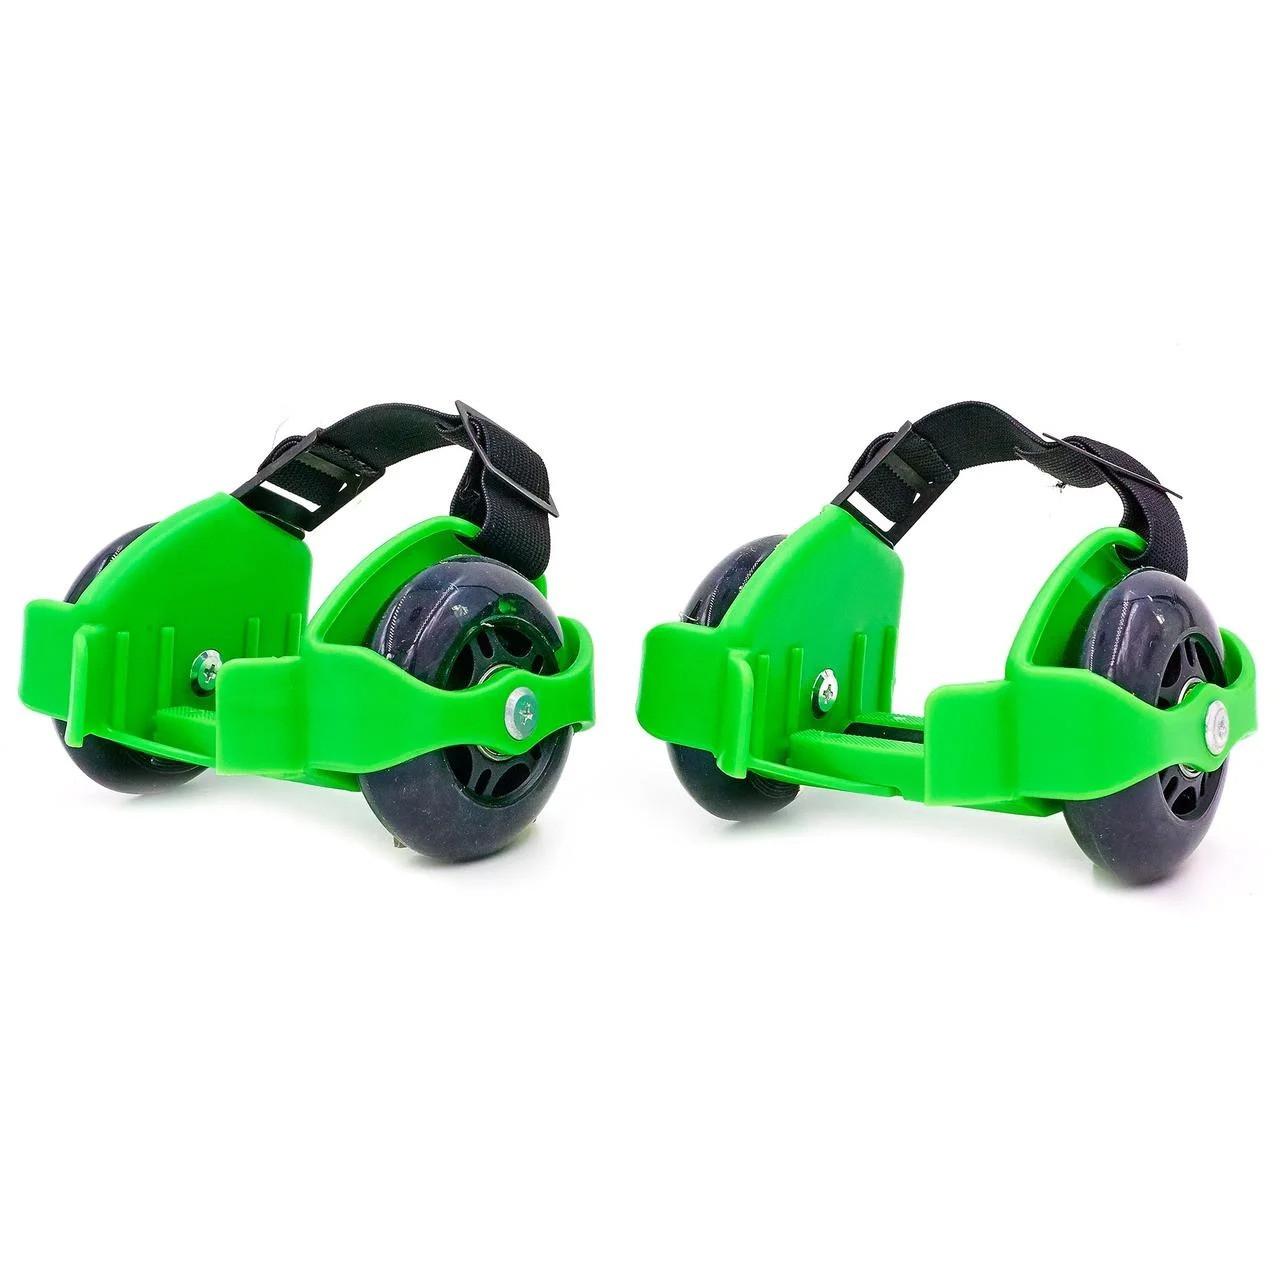 Съемные ролики на обувь Small whirlwind pulley Зеленые, ролики на обувь купить   знімні ролики на взуття (NS)